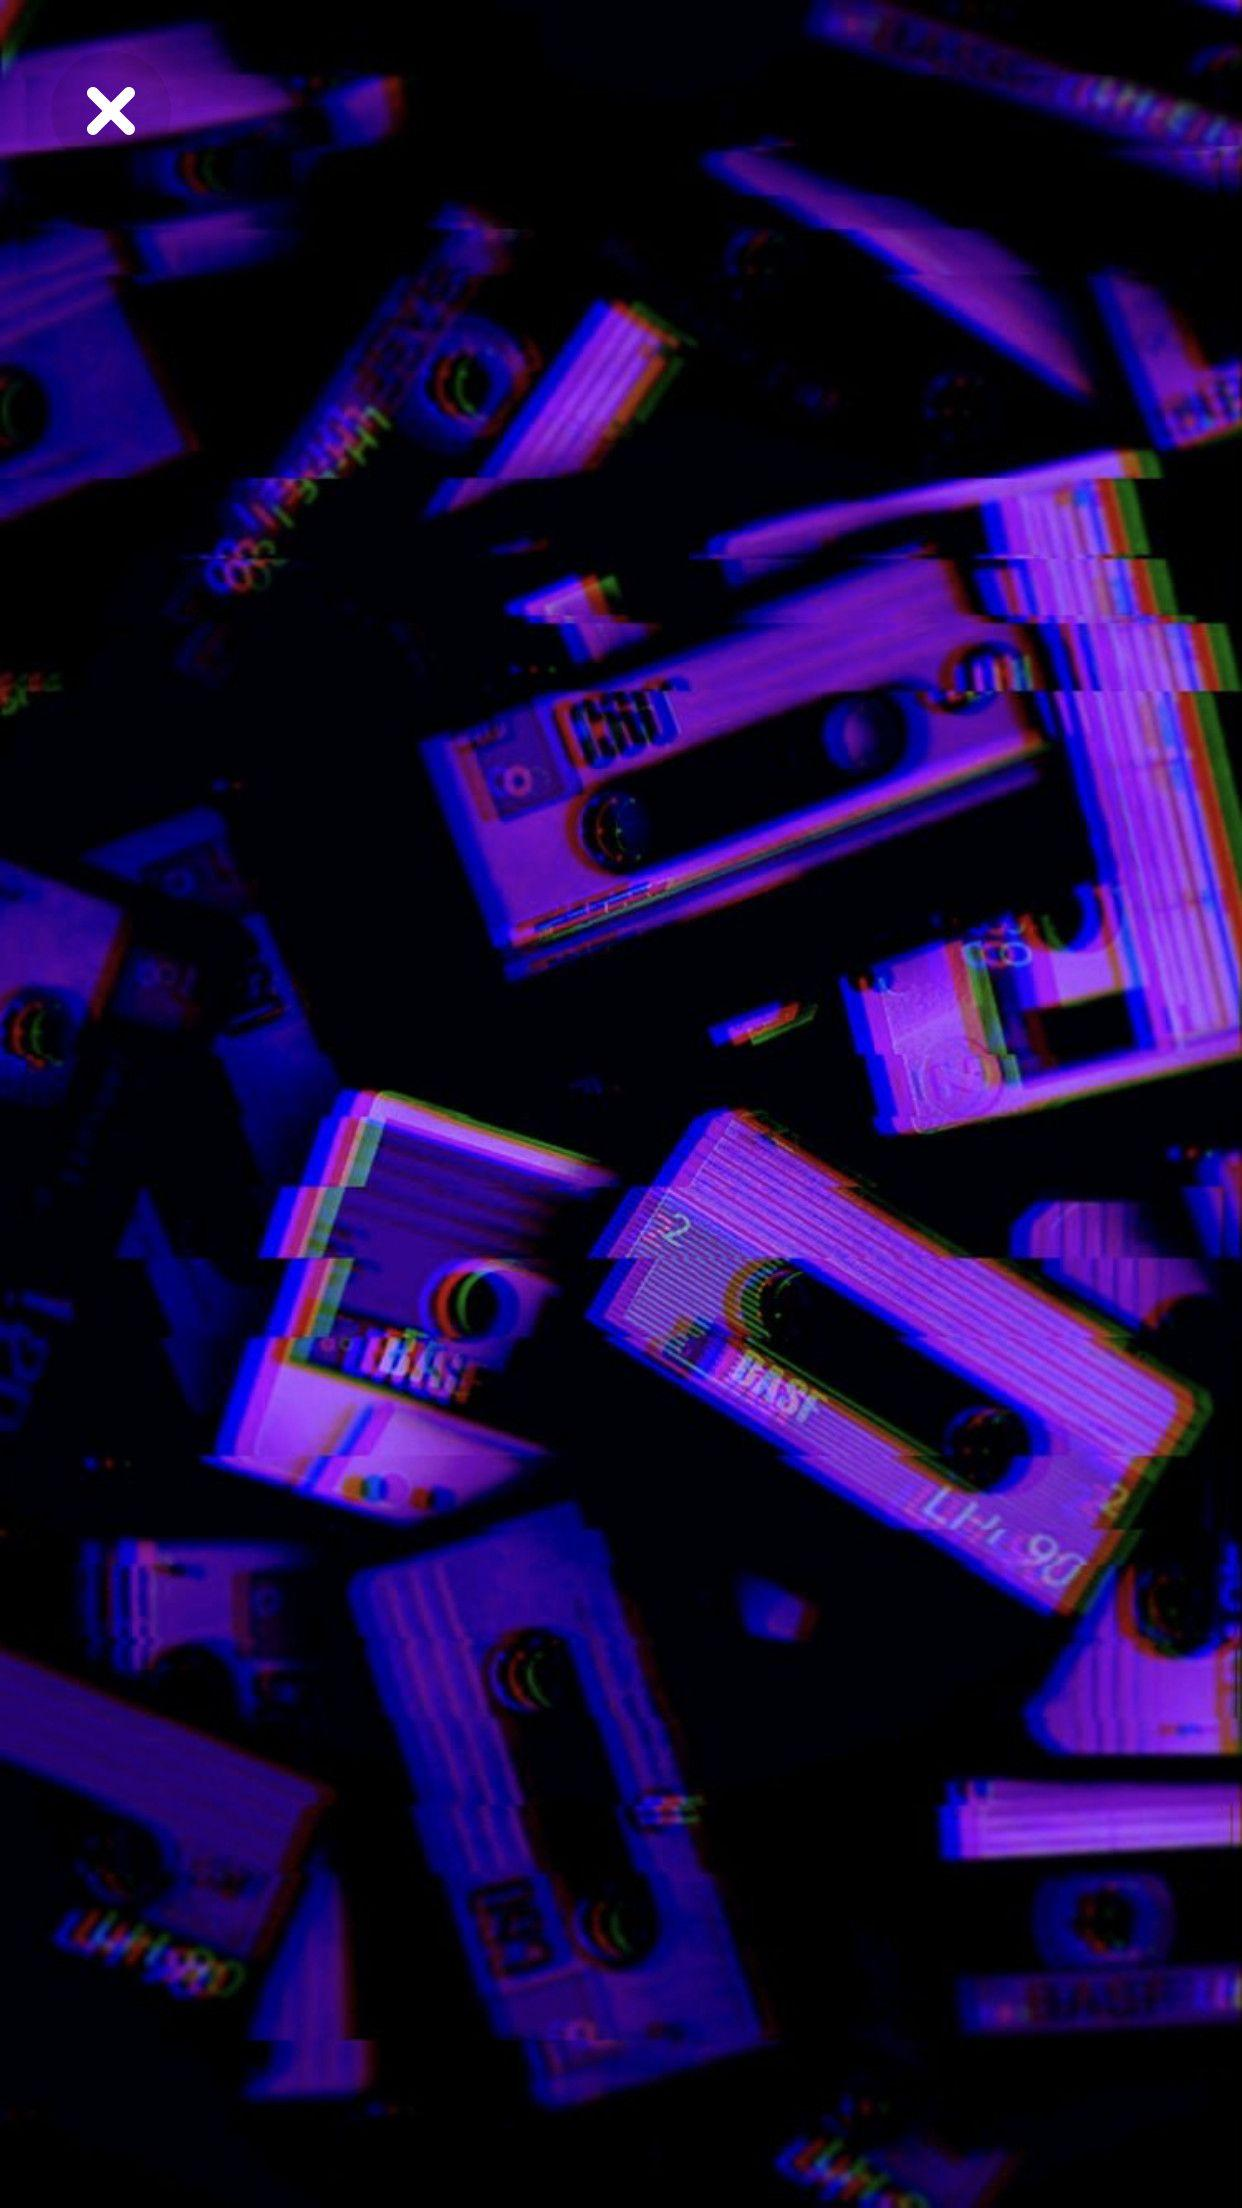 VHS wallpaper is pretty